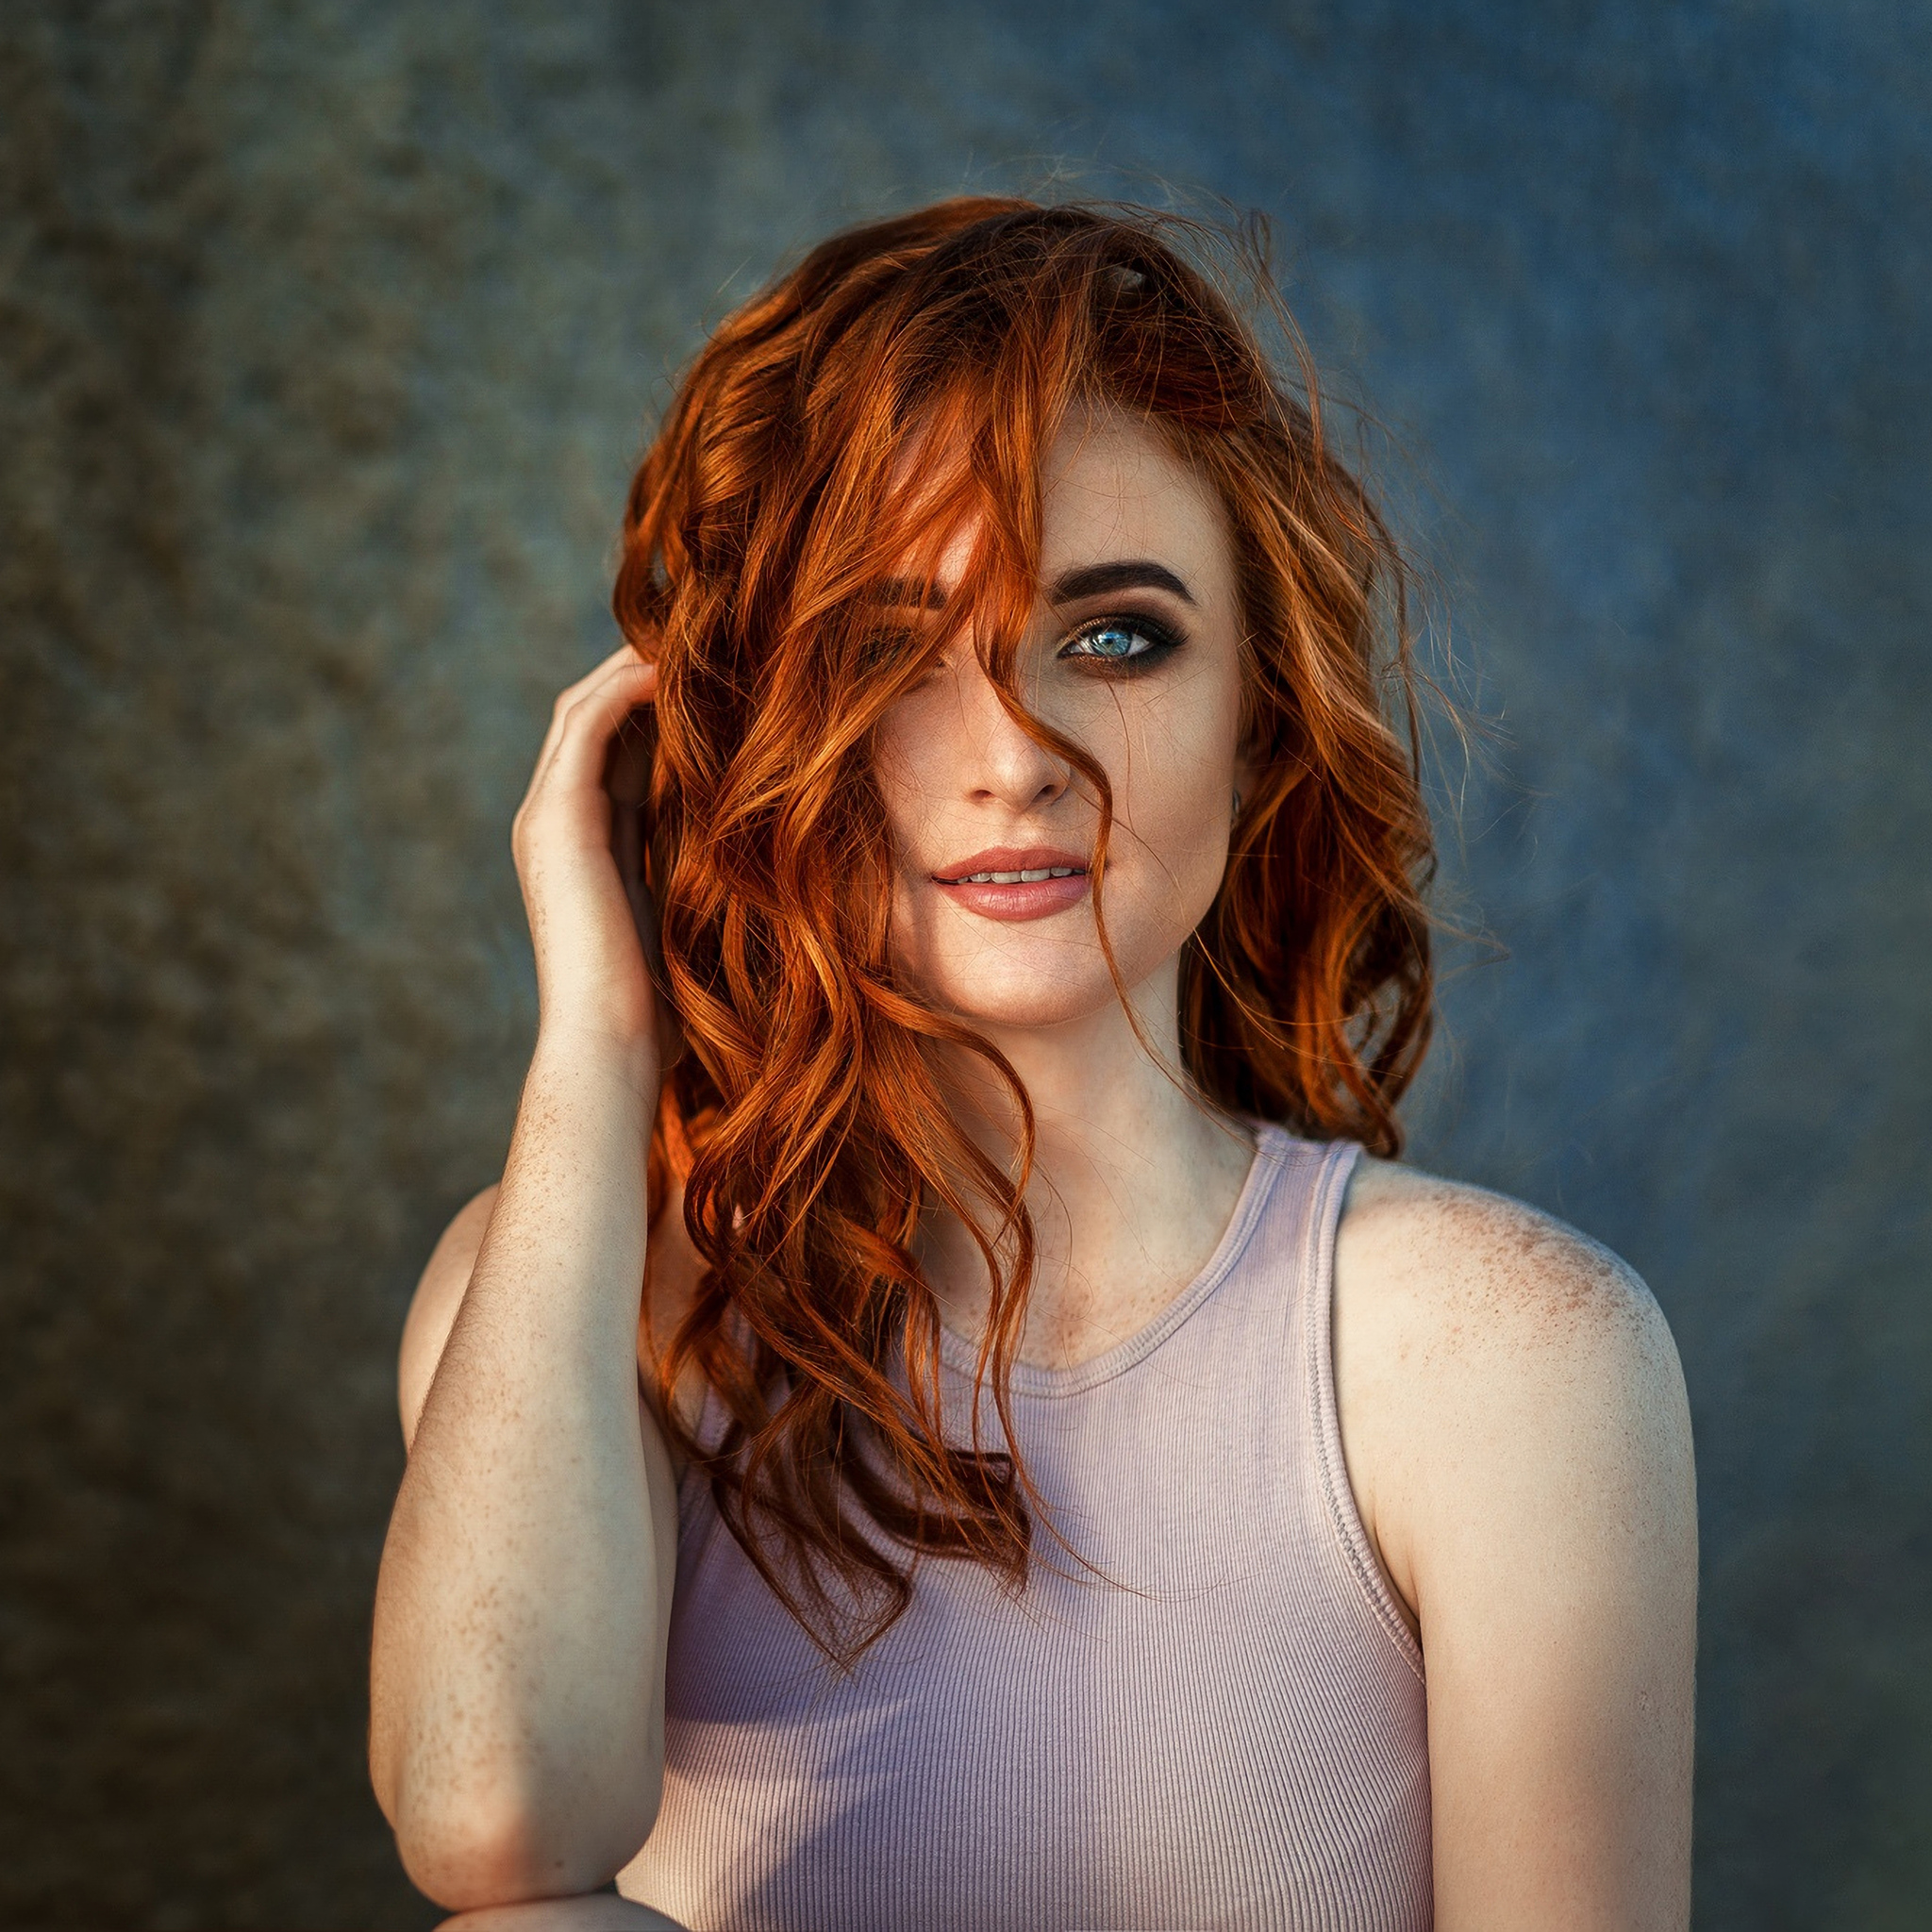 Porn redhead beauty Redhead: 240,621